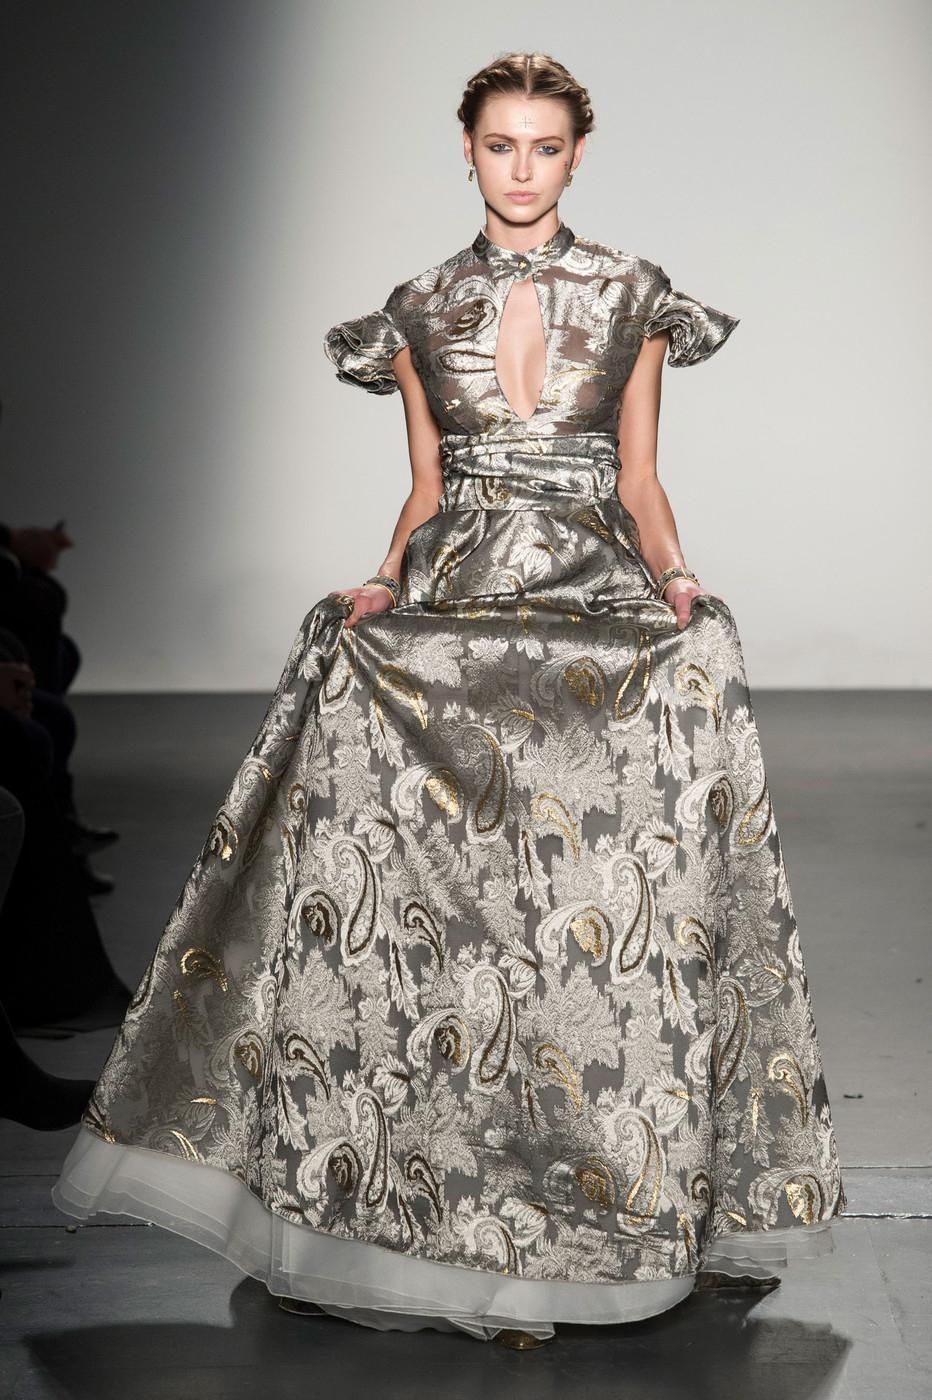 d5c2040d94ce6 Lyst - John Paul Ataker Ruffle Sleeve Gown in Metallic